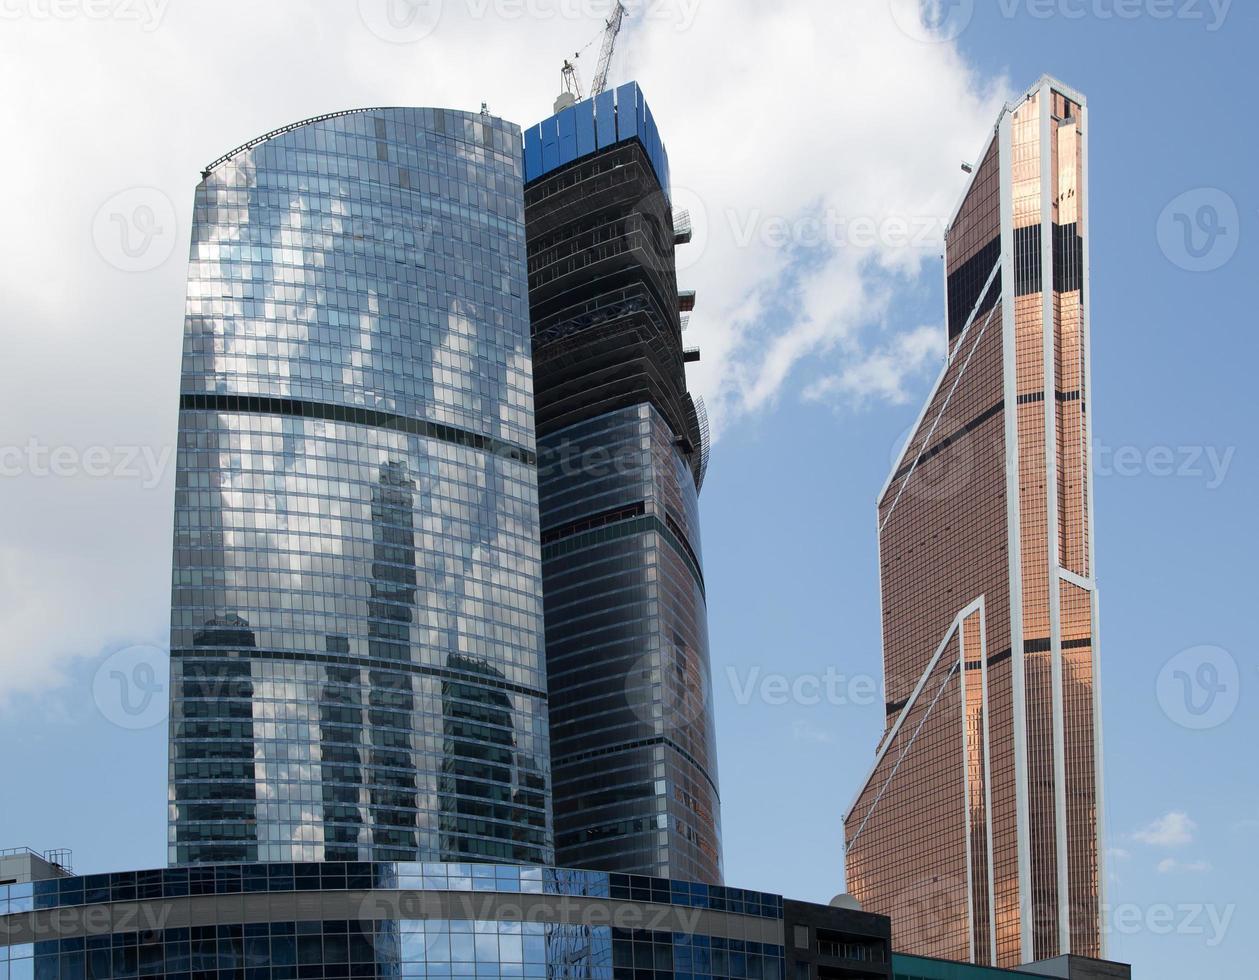 wolkenkrabbers van het internationale zakencentrum (stad), Moskou, Rusland foto